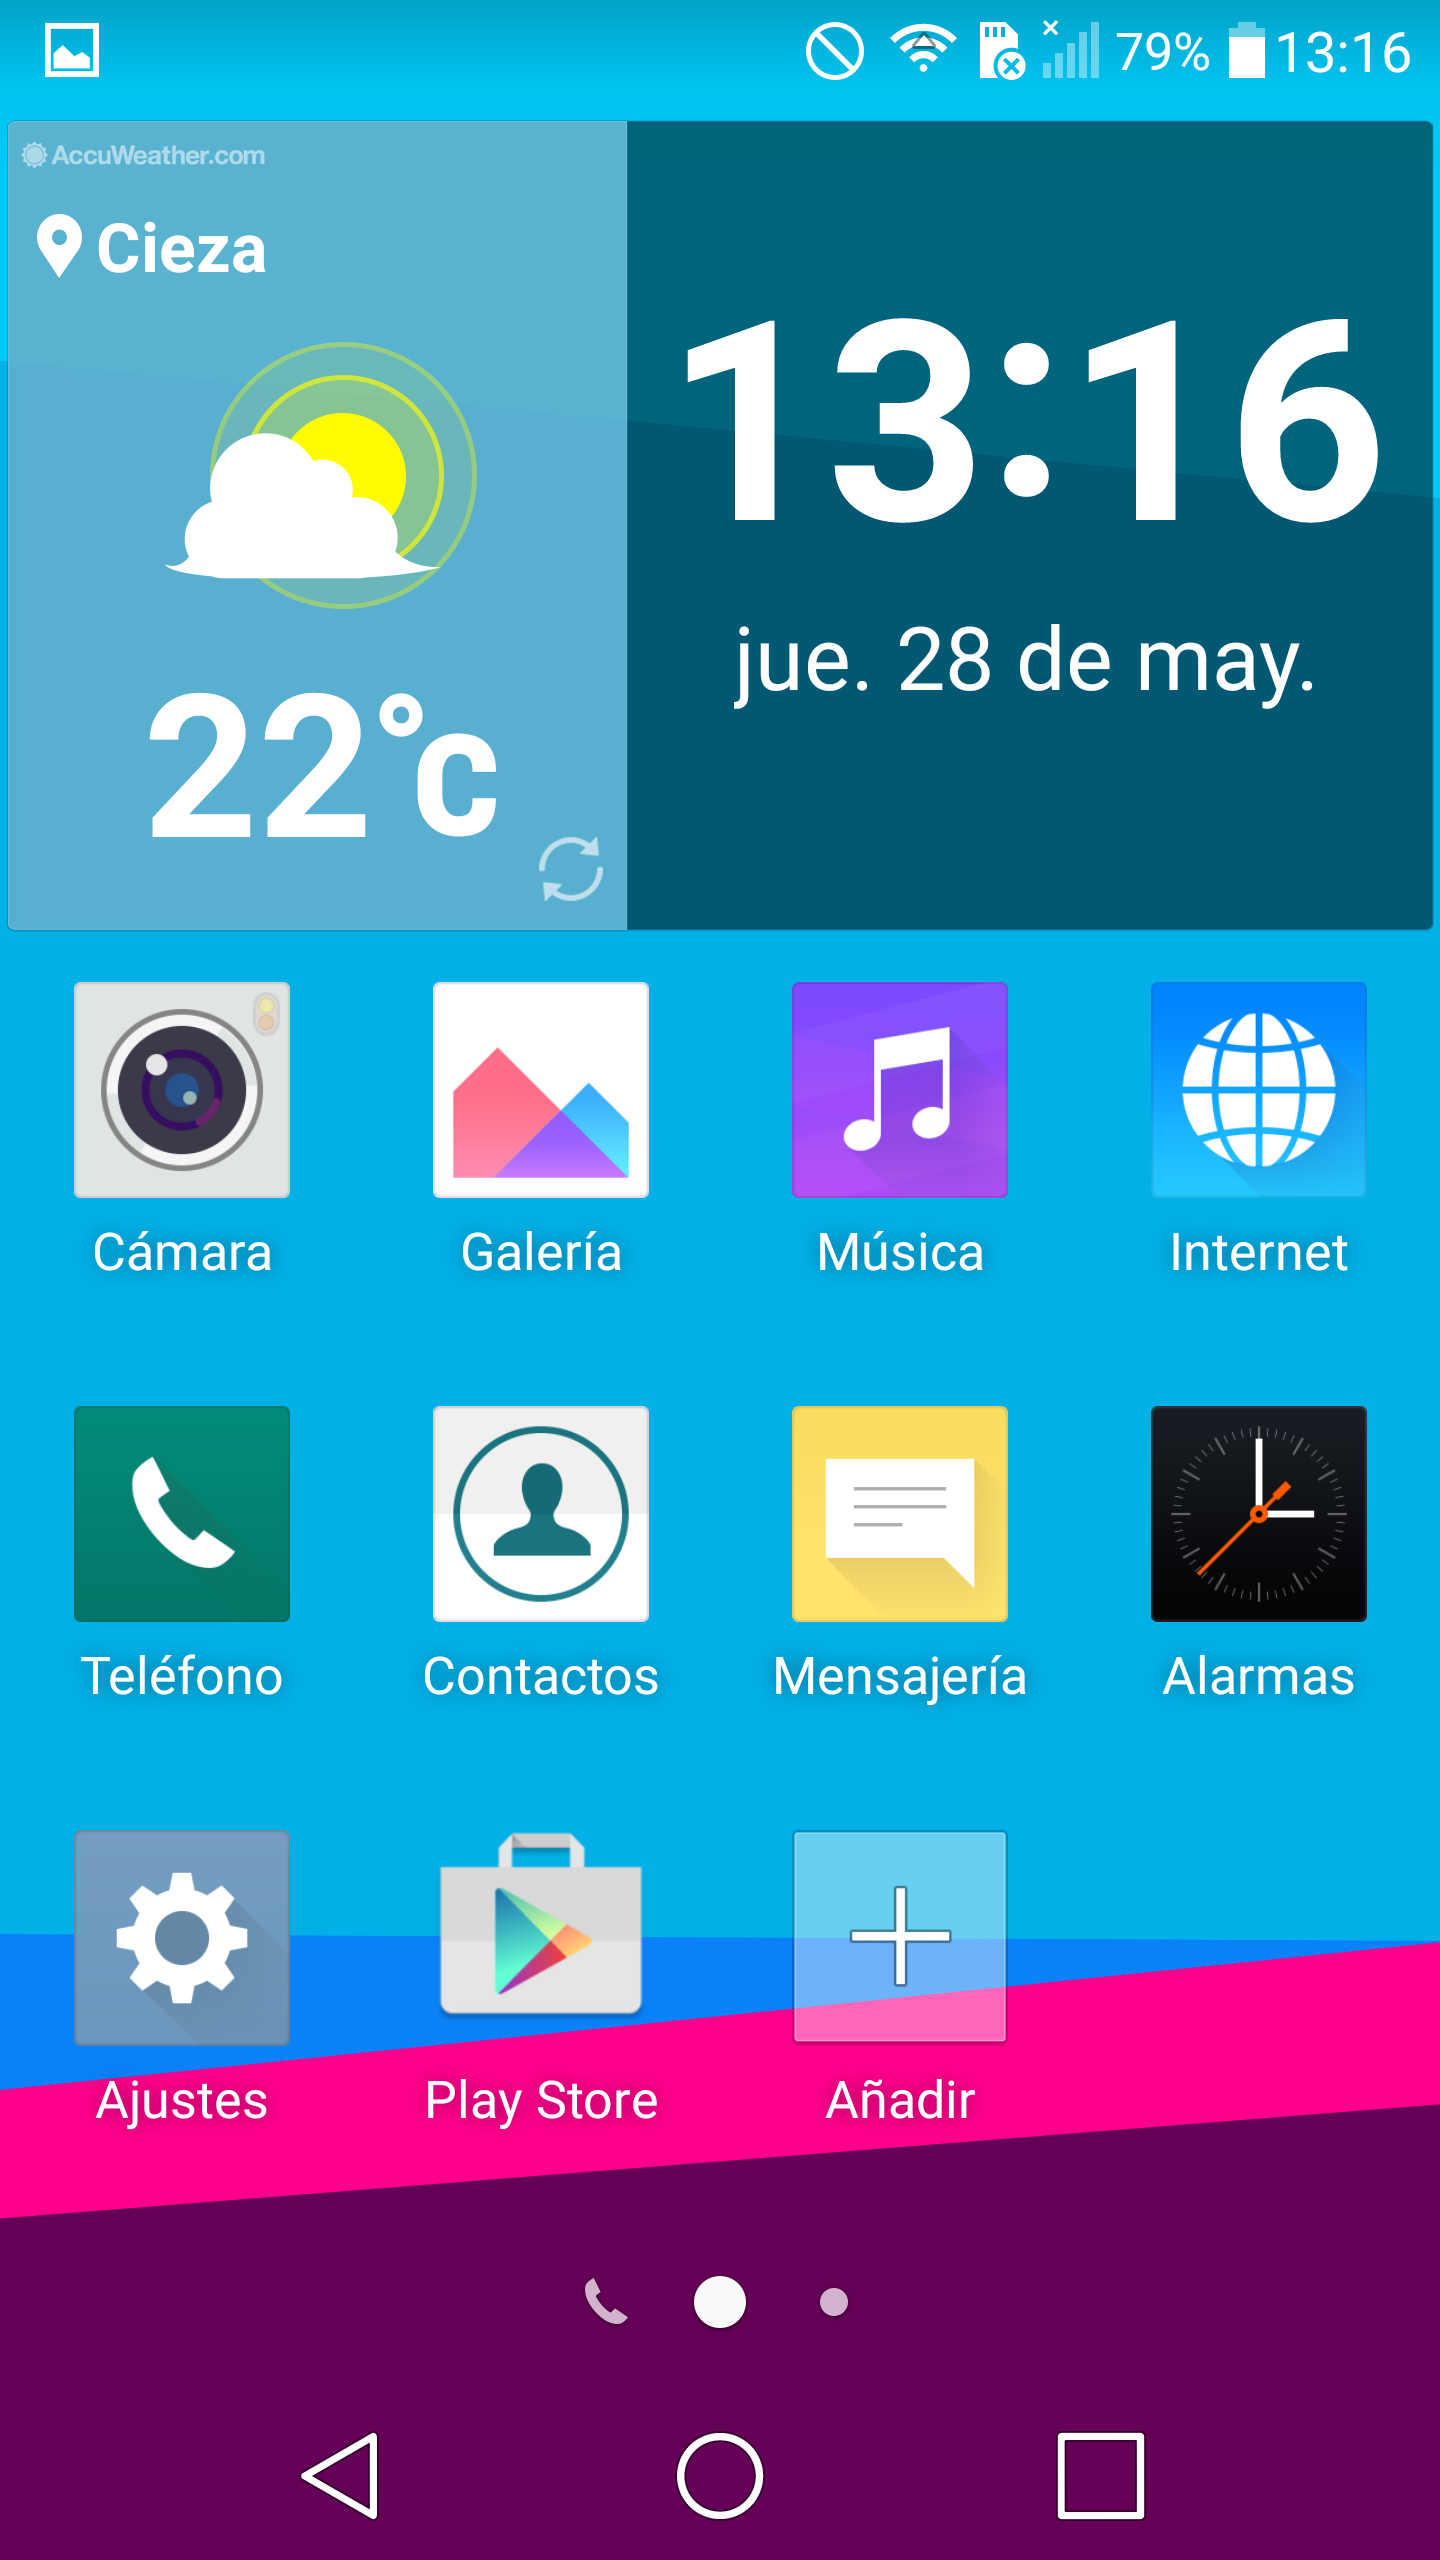 LG G4 interfaz